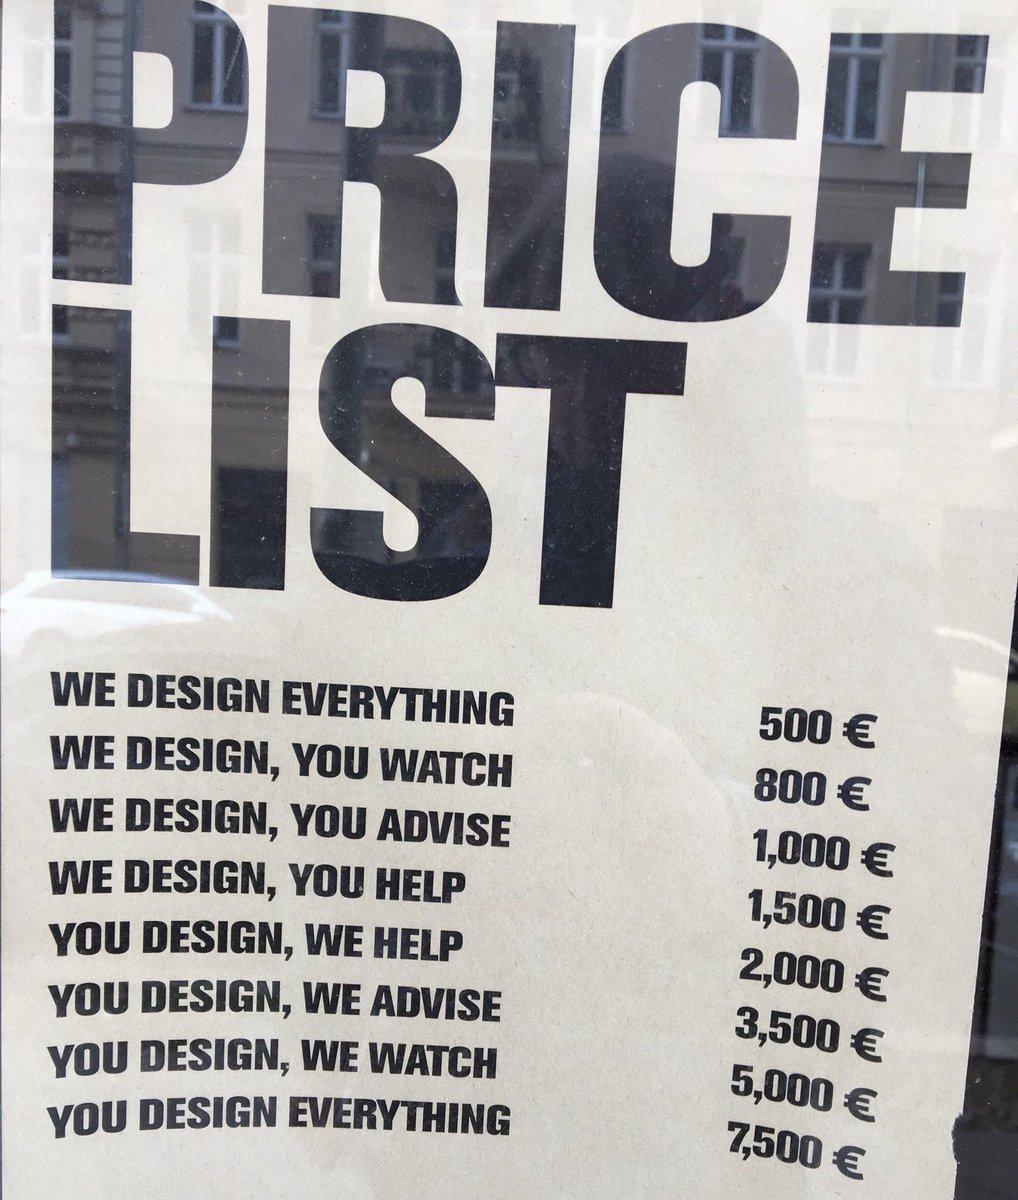 Design Studio Berlin hjalti hjalmarsson on price list of a design studio in